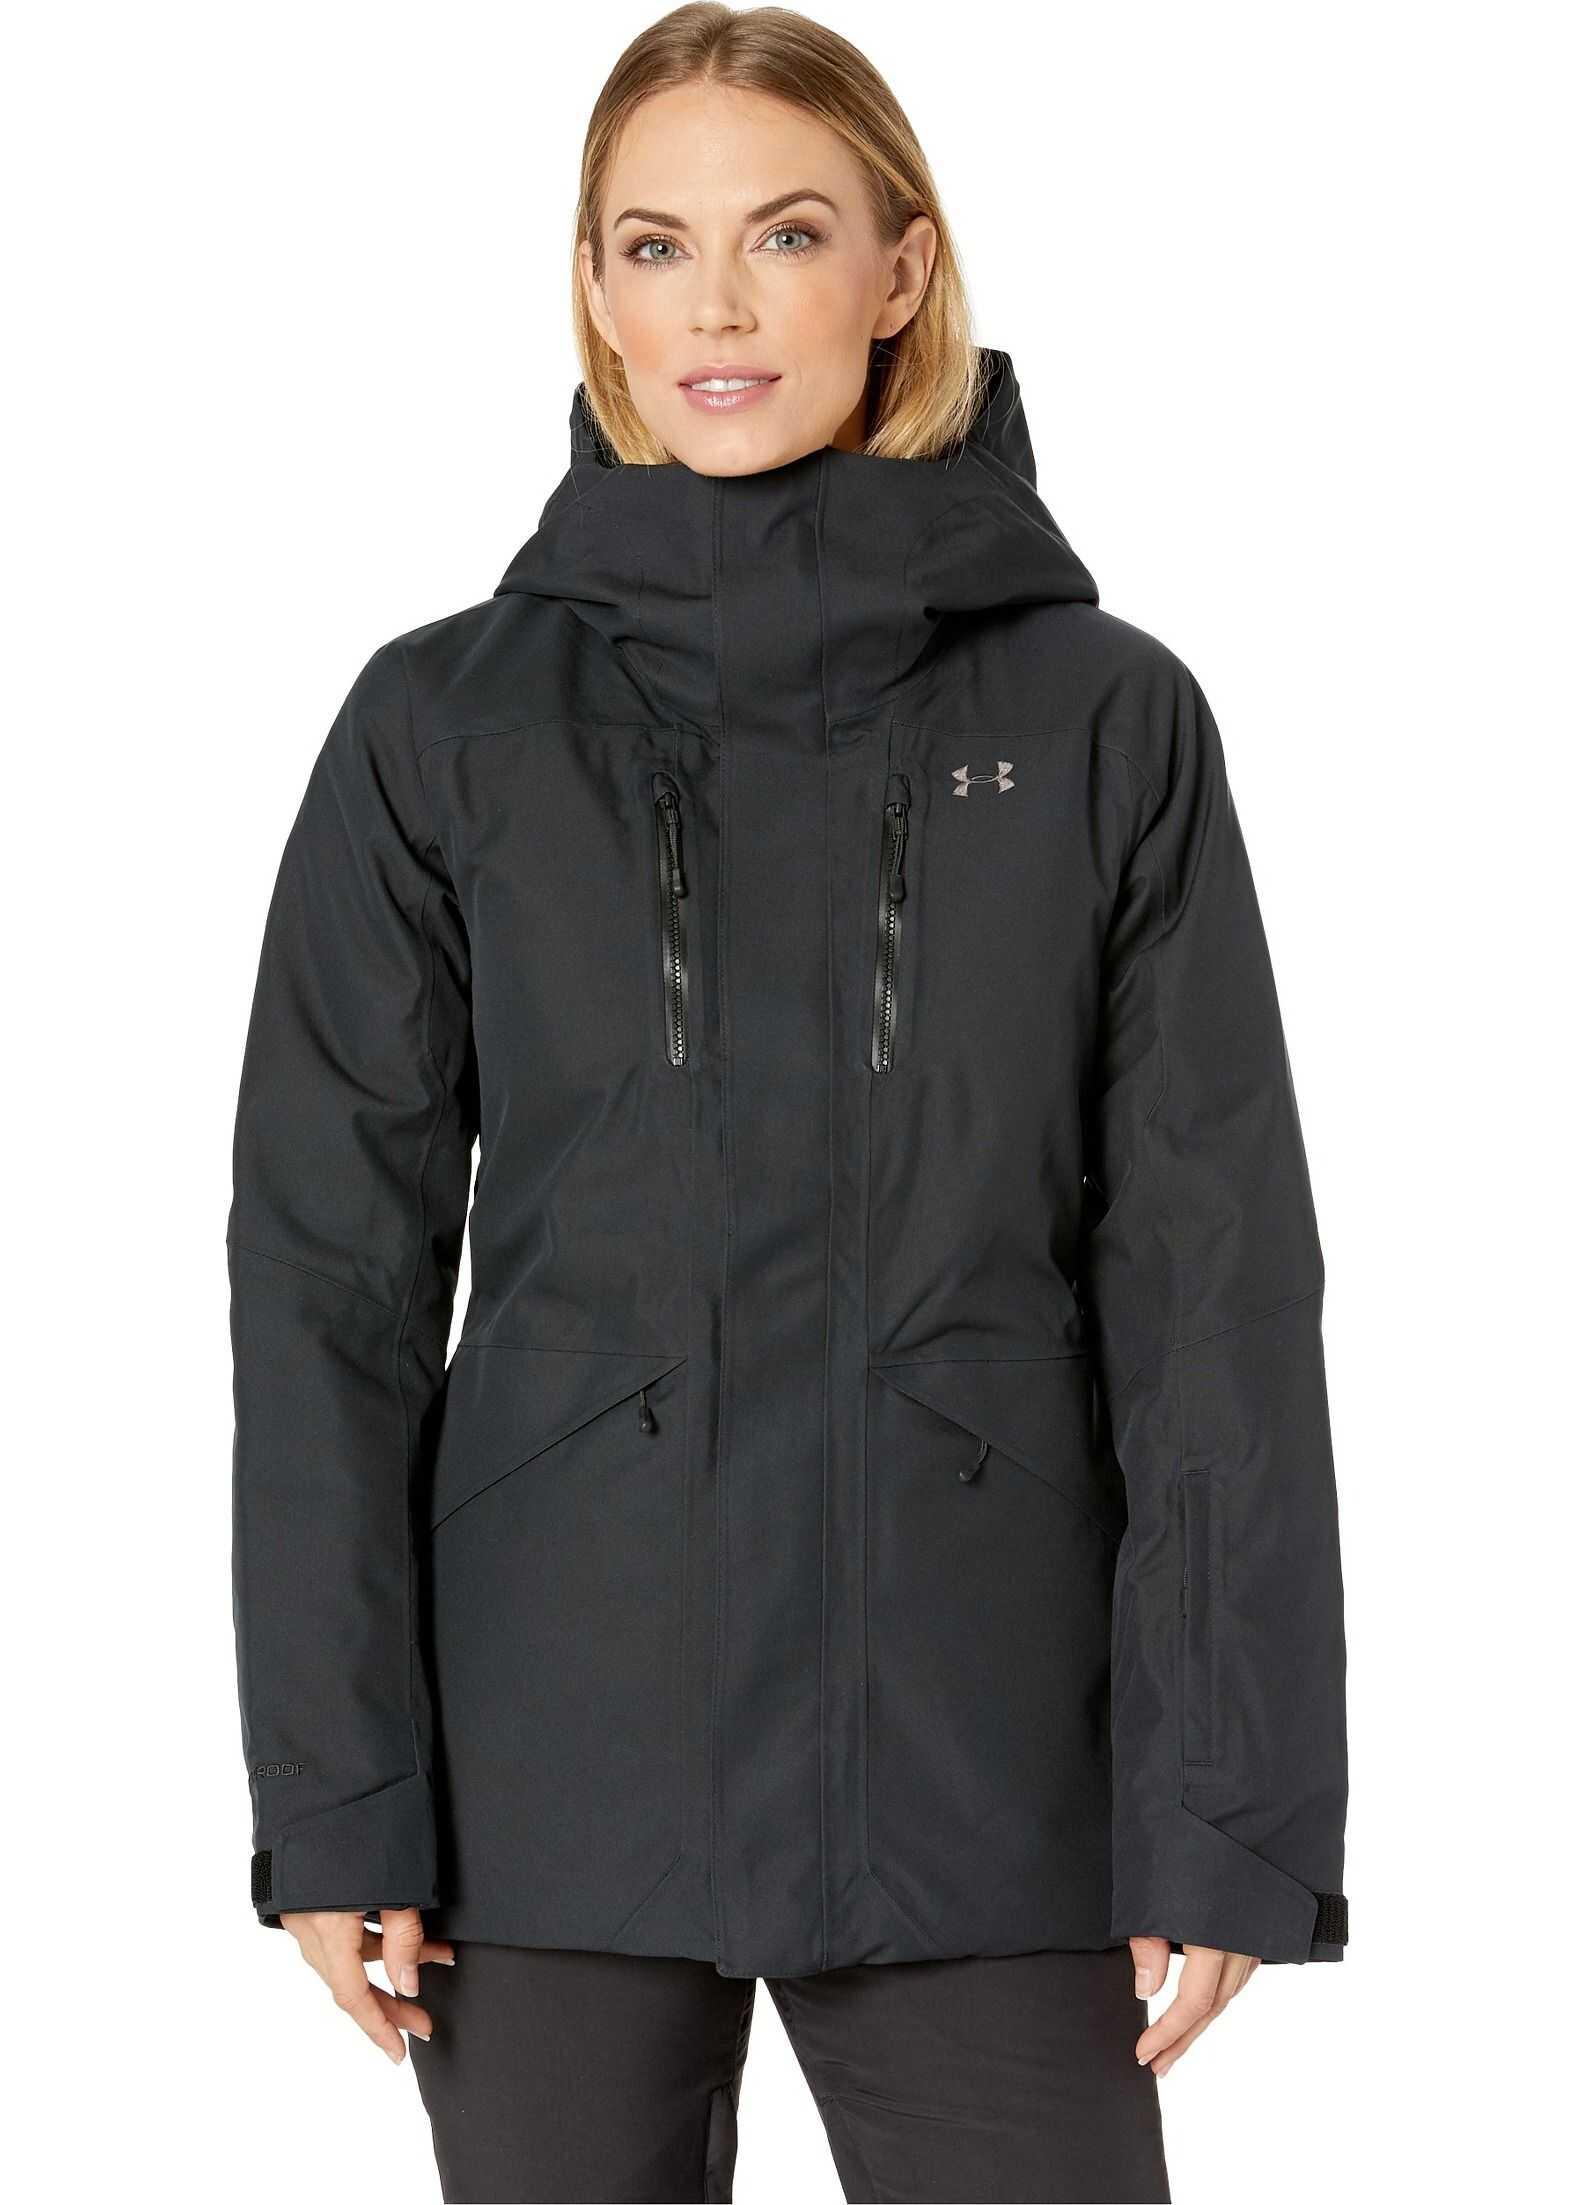 Under Armour UA Emergent Jacket Black/Charcoal/Charcoal